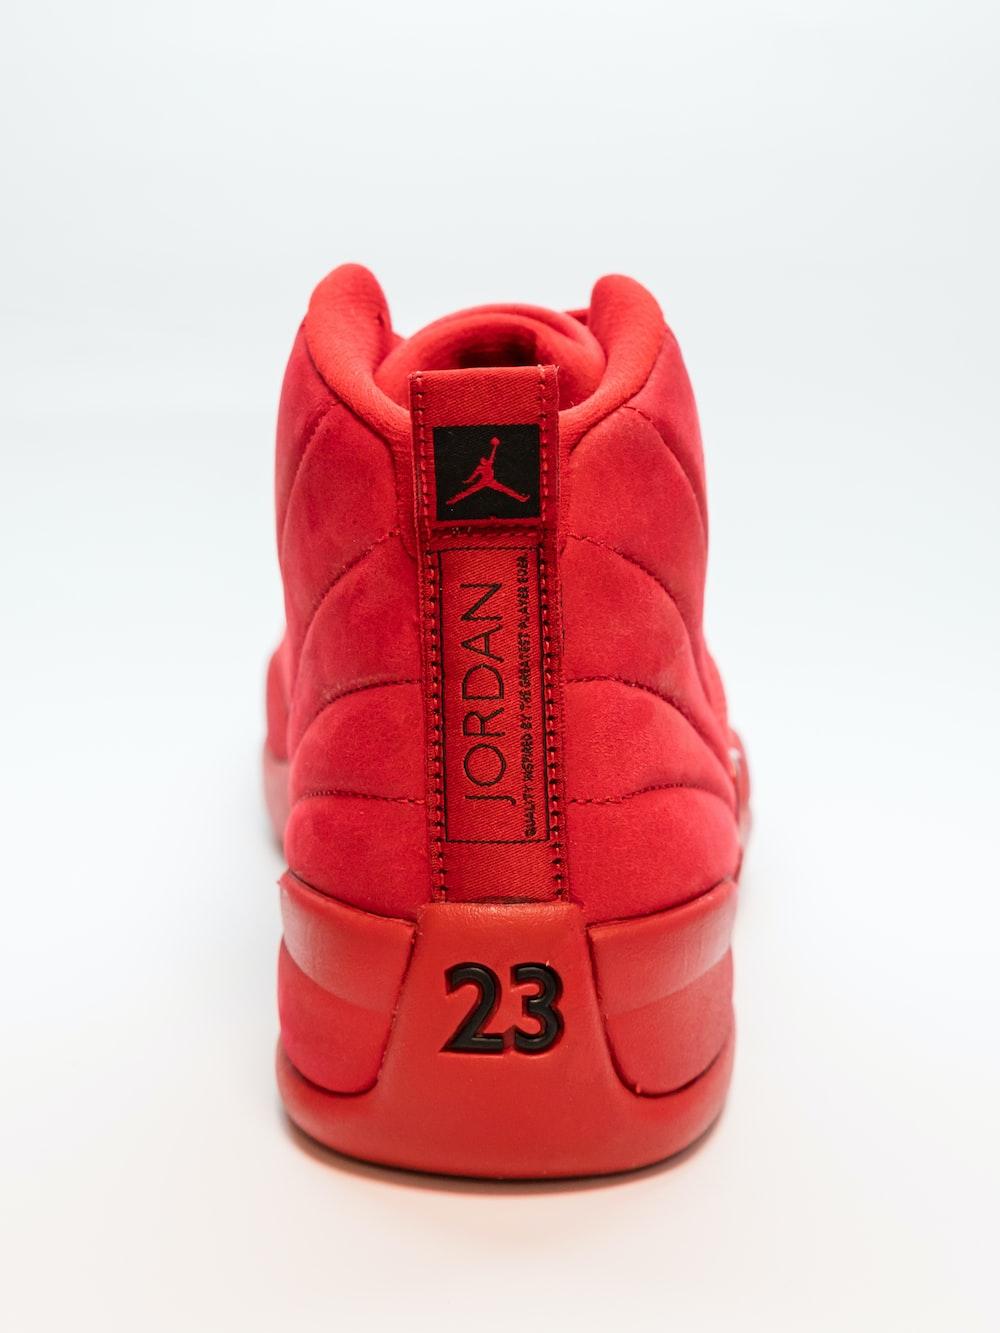 unpaired red Air Jordan basketball shoe